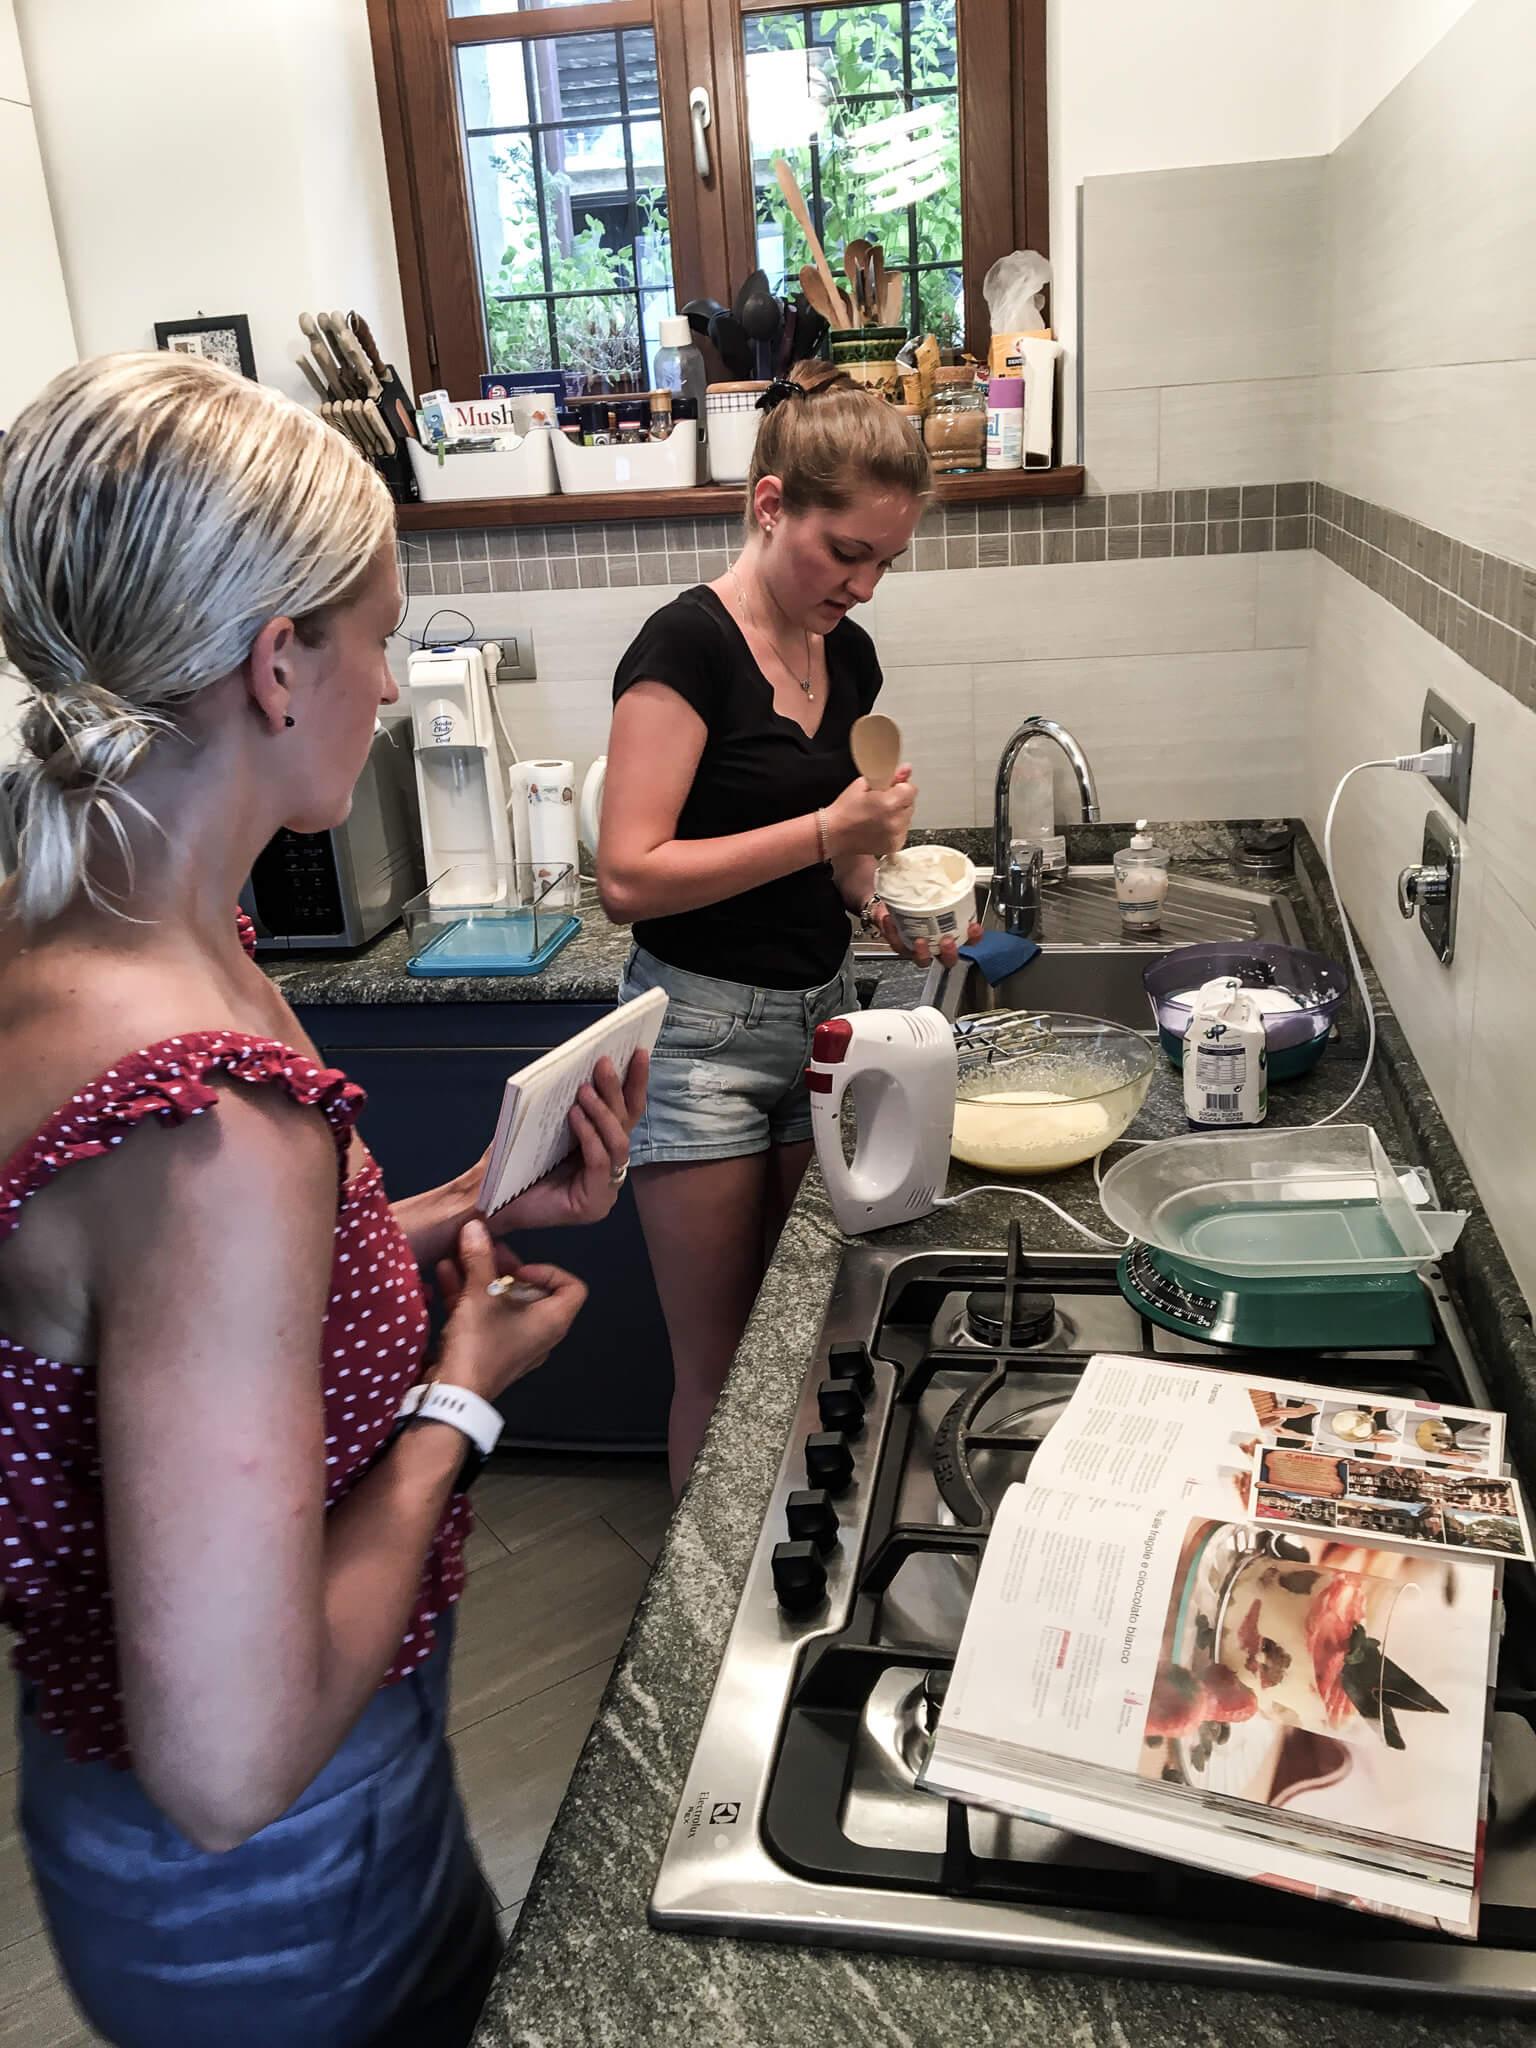 Tiramisu www.sarahkayhoffman.com #tiramisu #dessert #italy making with Ceci Italian kitchen